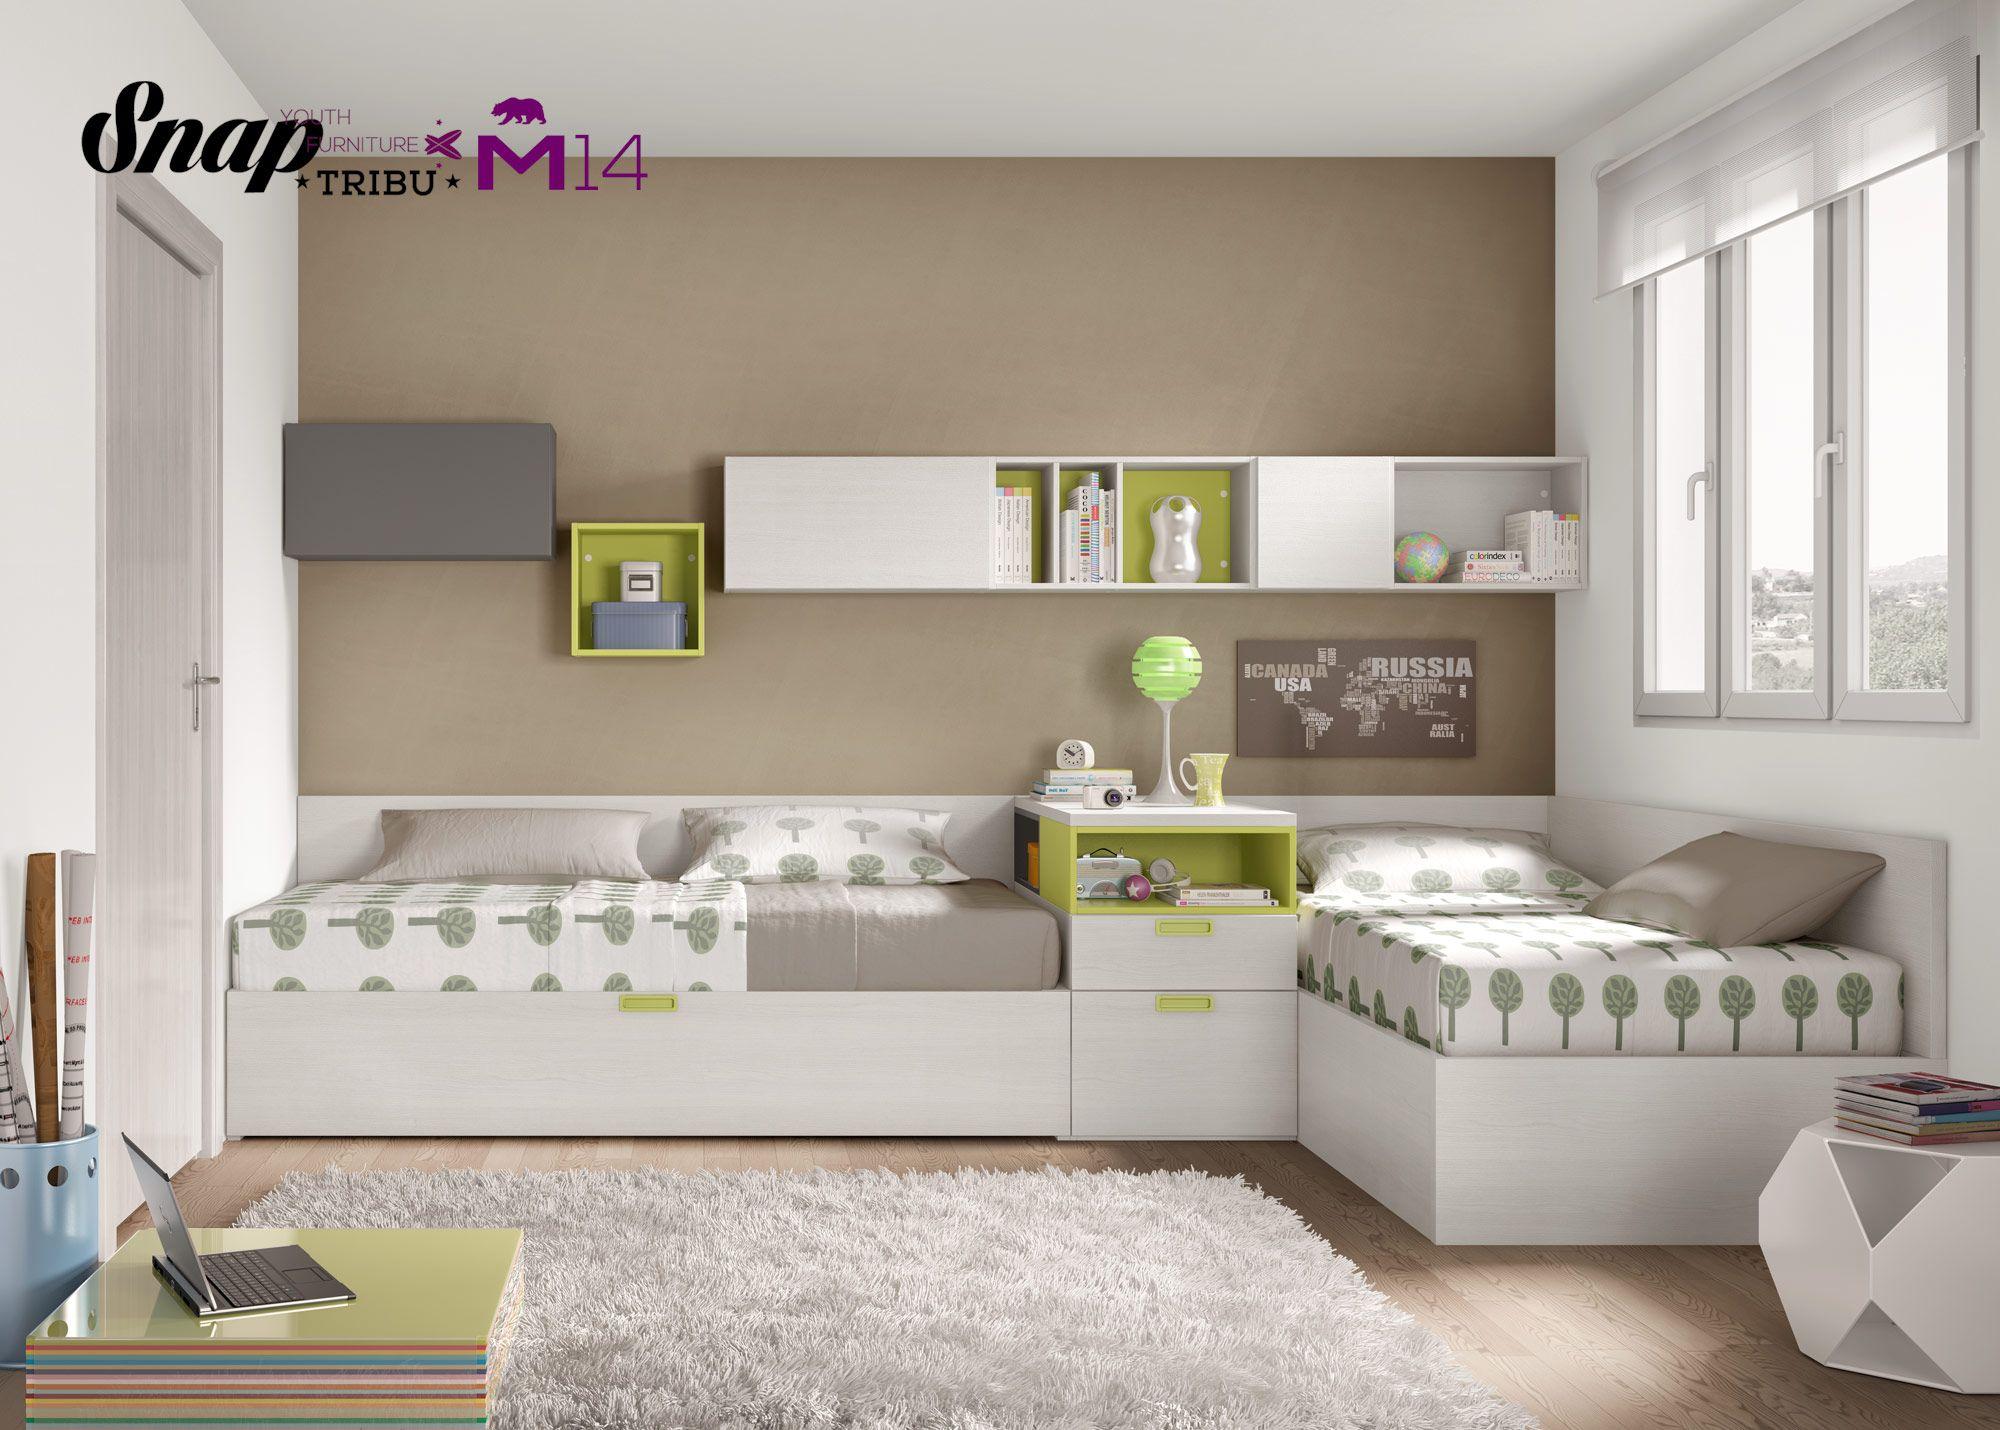 Tribu snap muebles hermida mueble juvenil m14 - Dormitorios juveniles ninas ...